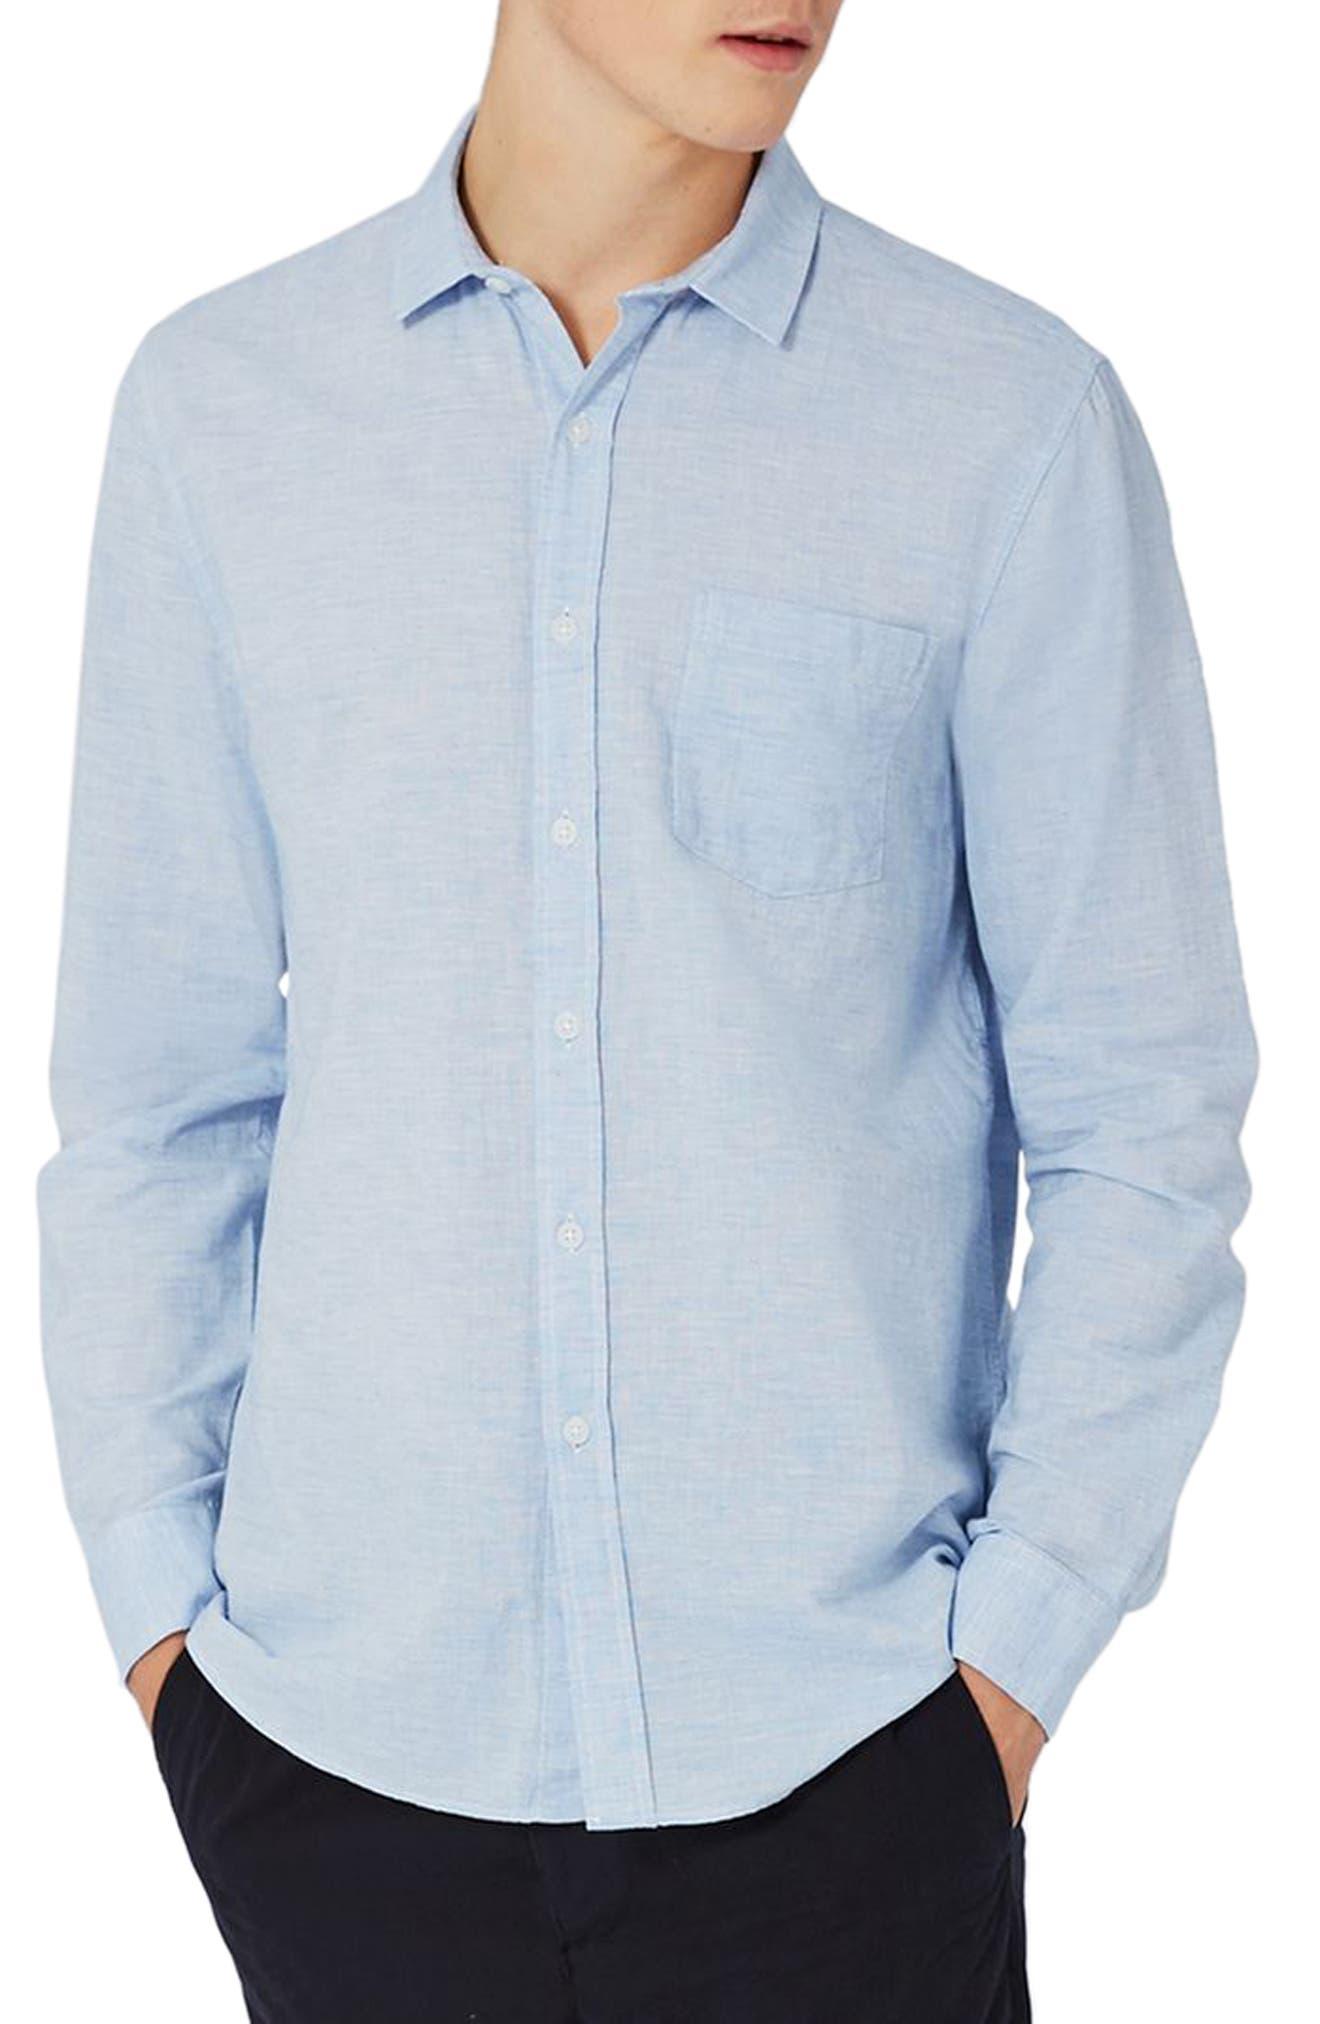 Topman Classic Fit Slub Woven Cotton & Linen Shirt